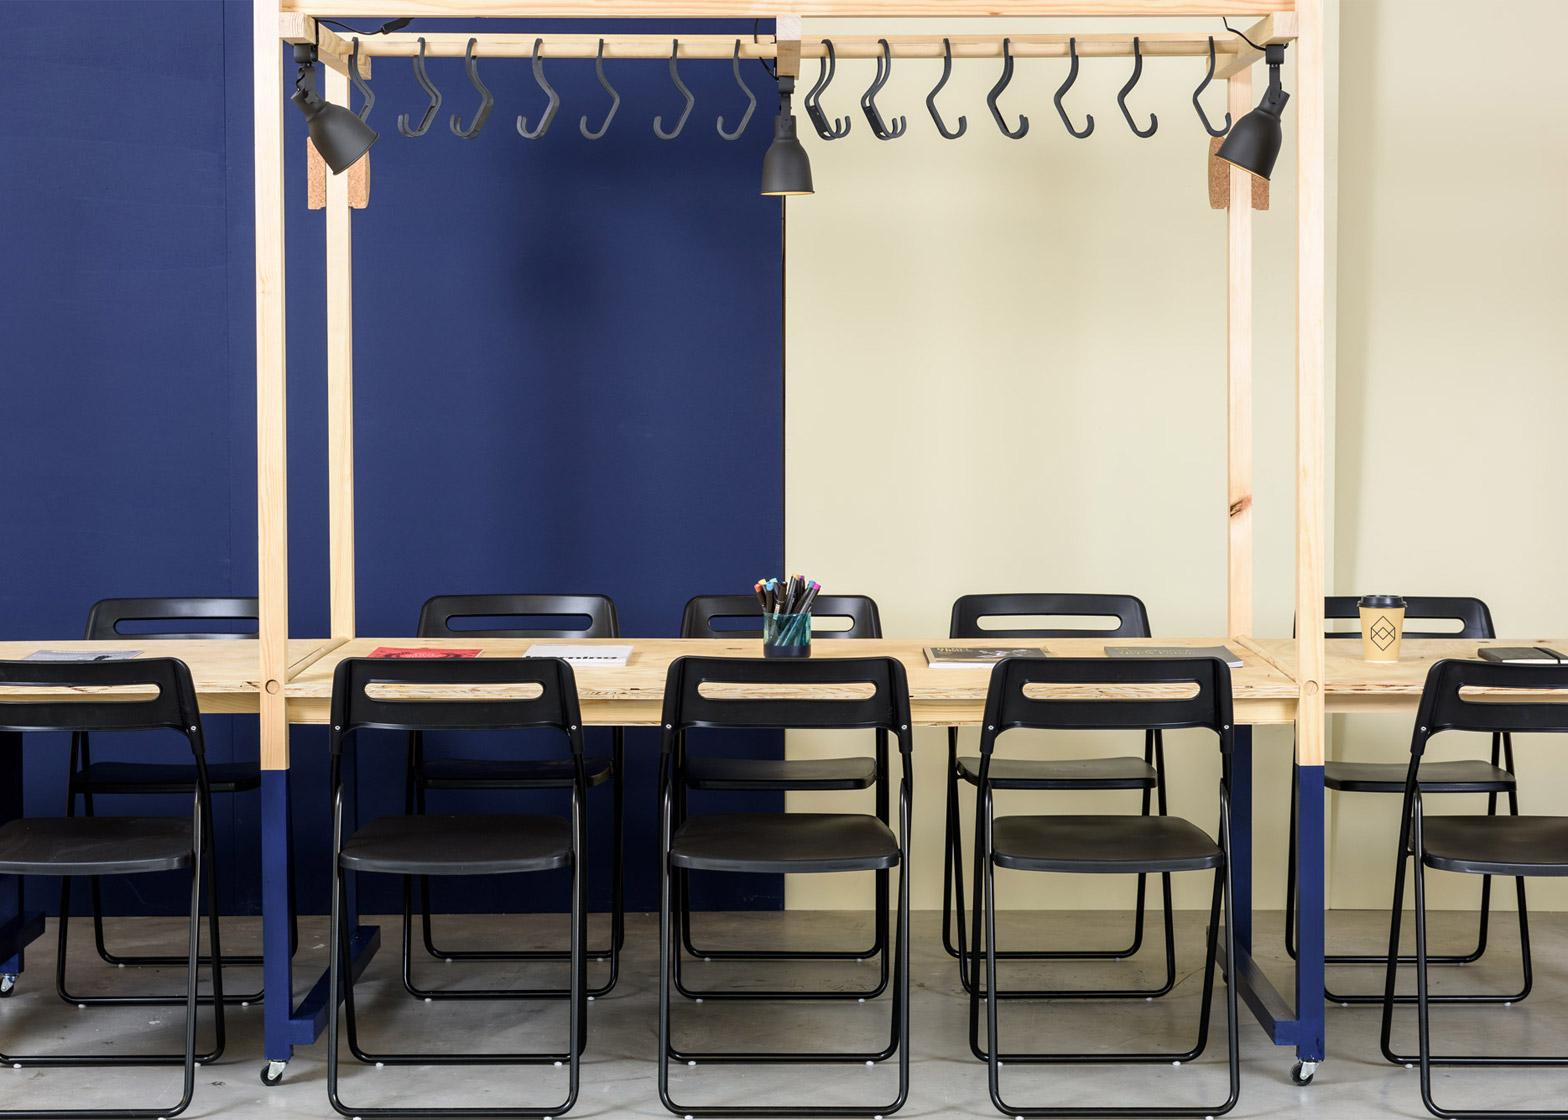 Ikea-Space-10-Innovation-Lab_Alastair-Philip-Wiper_dezeen_1568_16